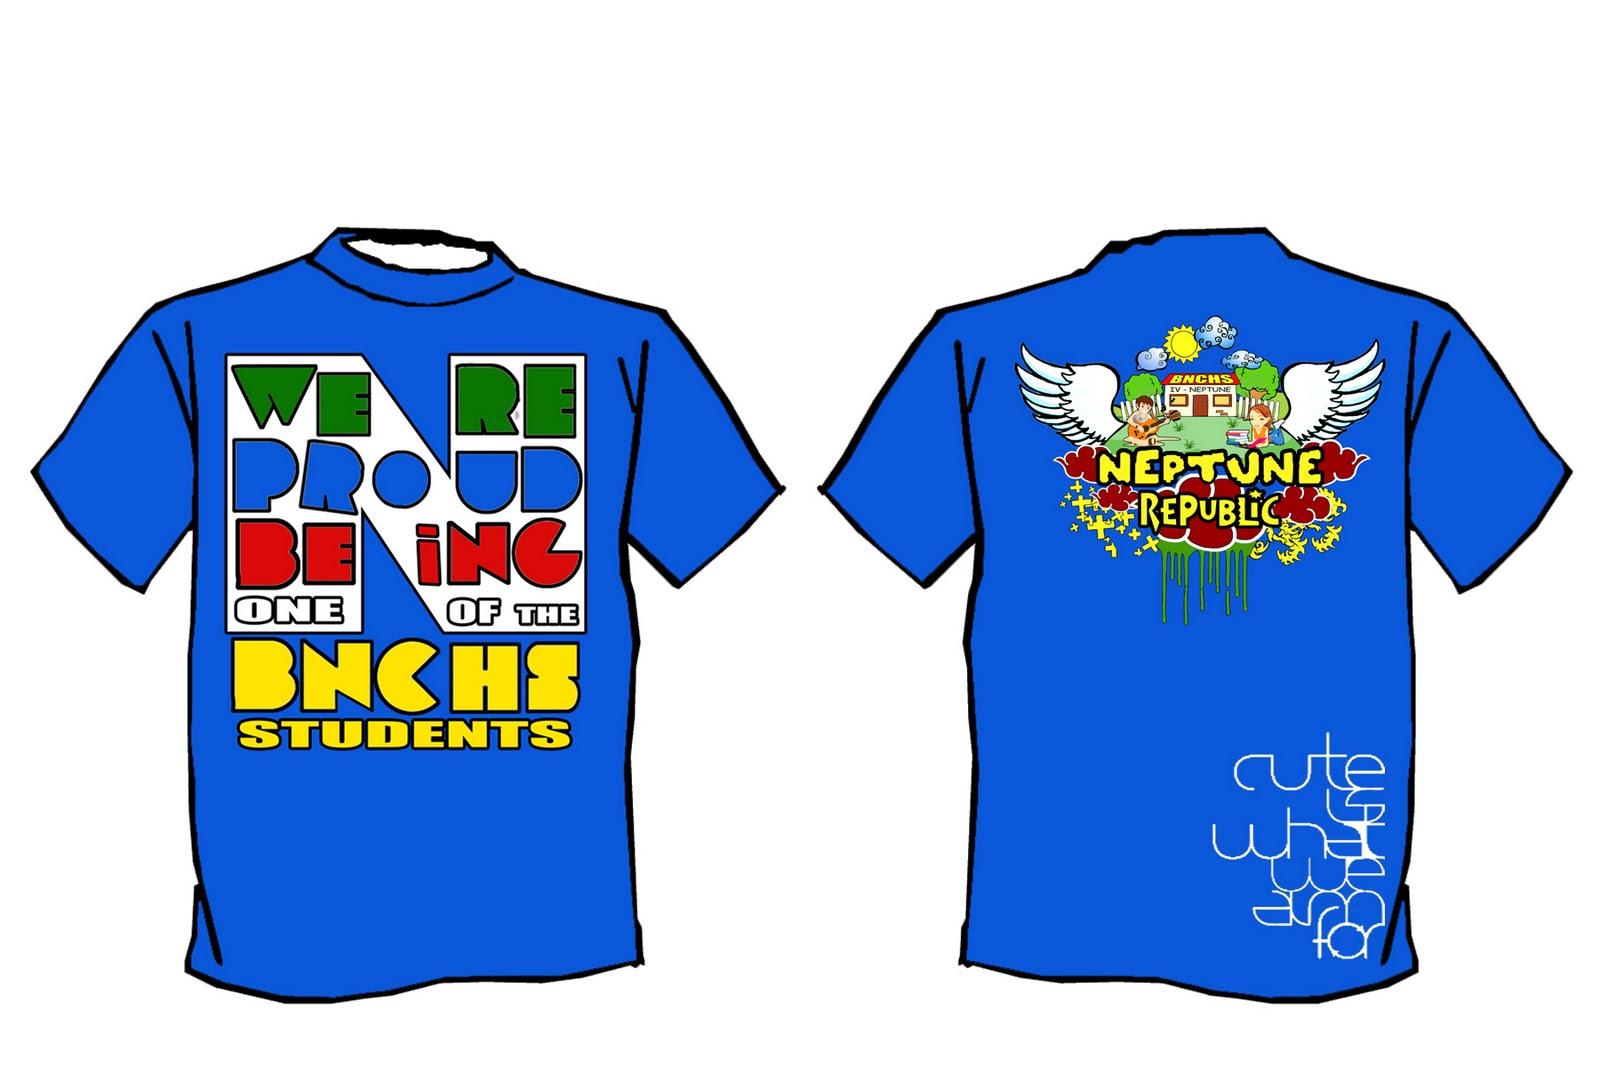 ecbe8ed34 T Shirt Design For School Alumni